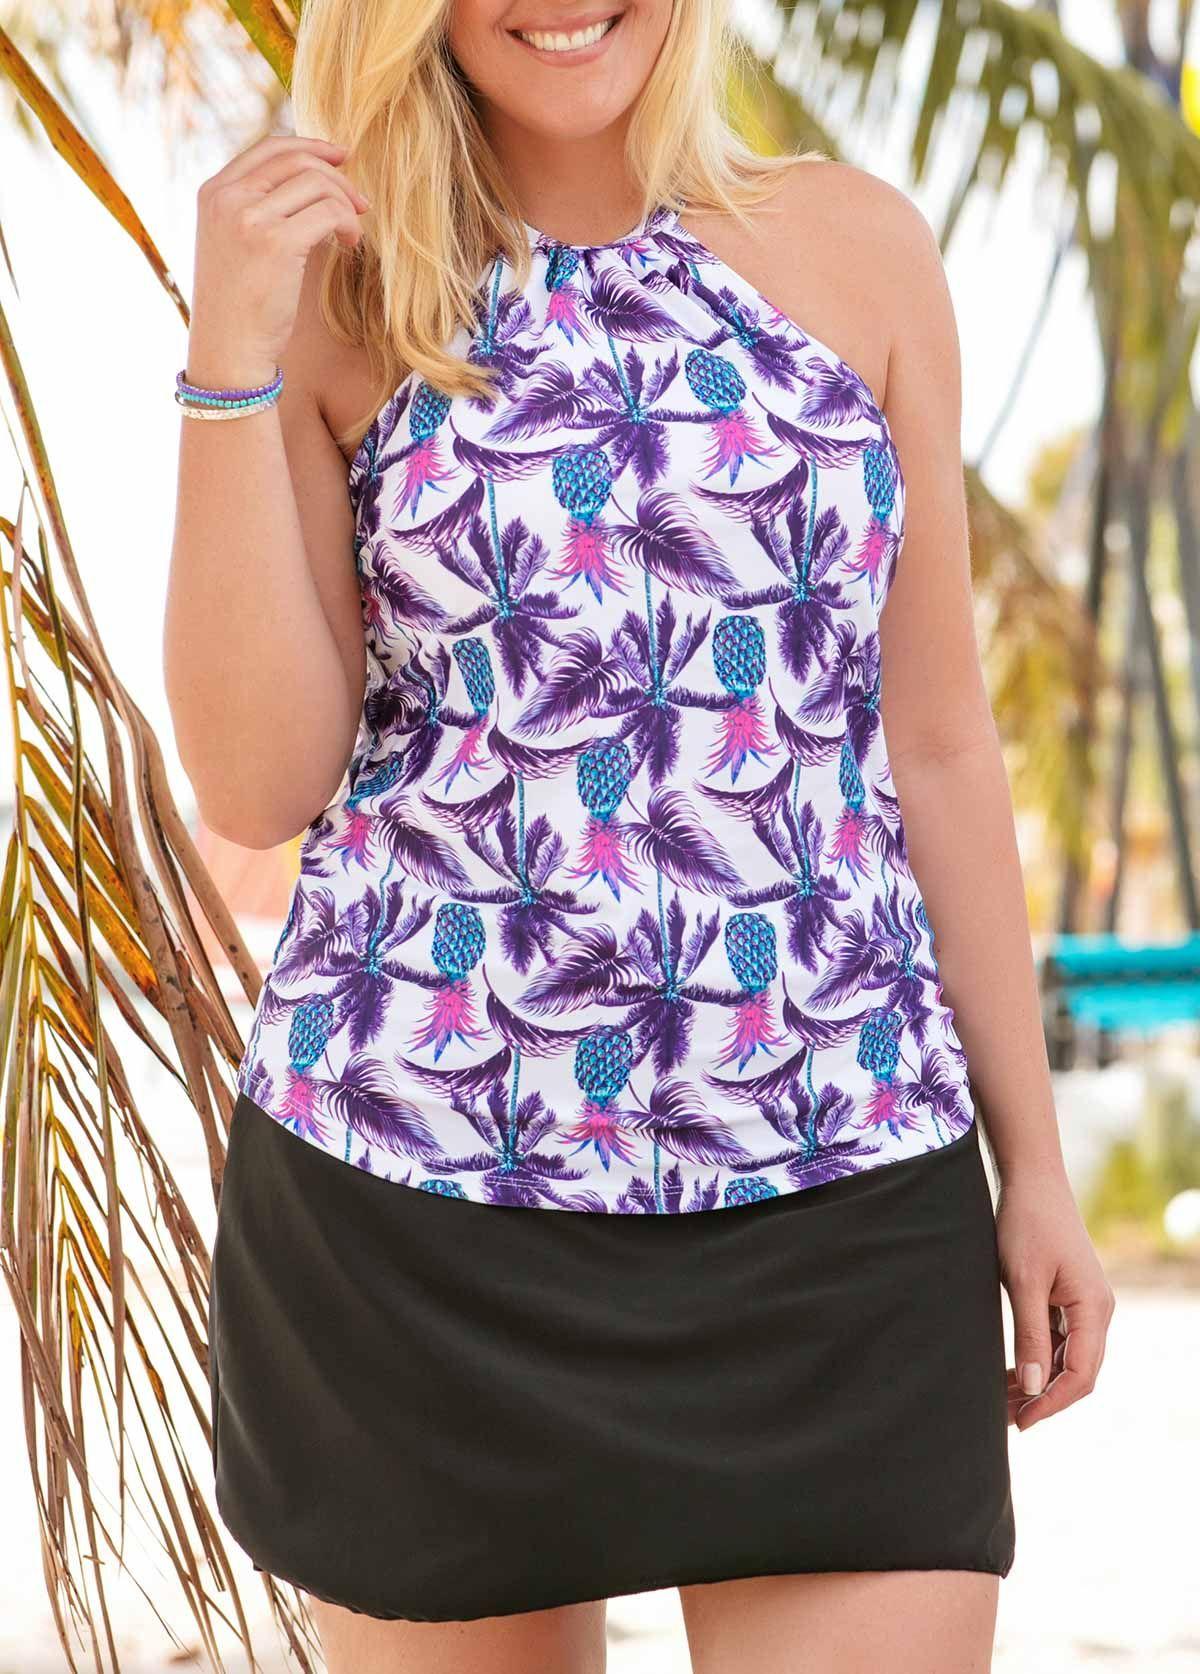 c1ecbbda45684 Printed Swimwear Top and Black Pantskirt - Plus Size